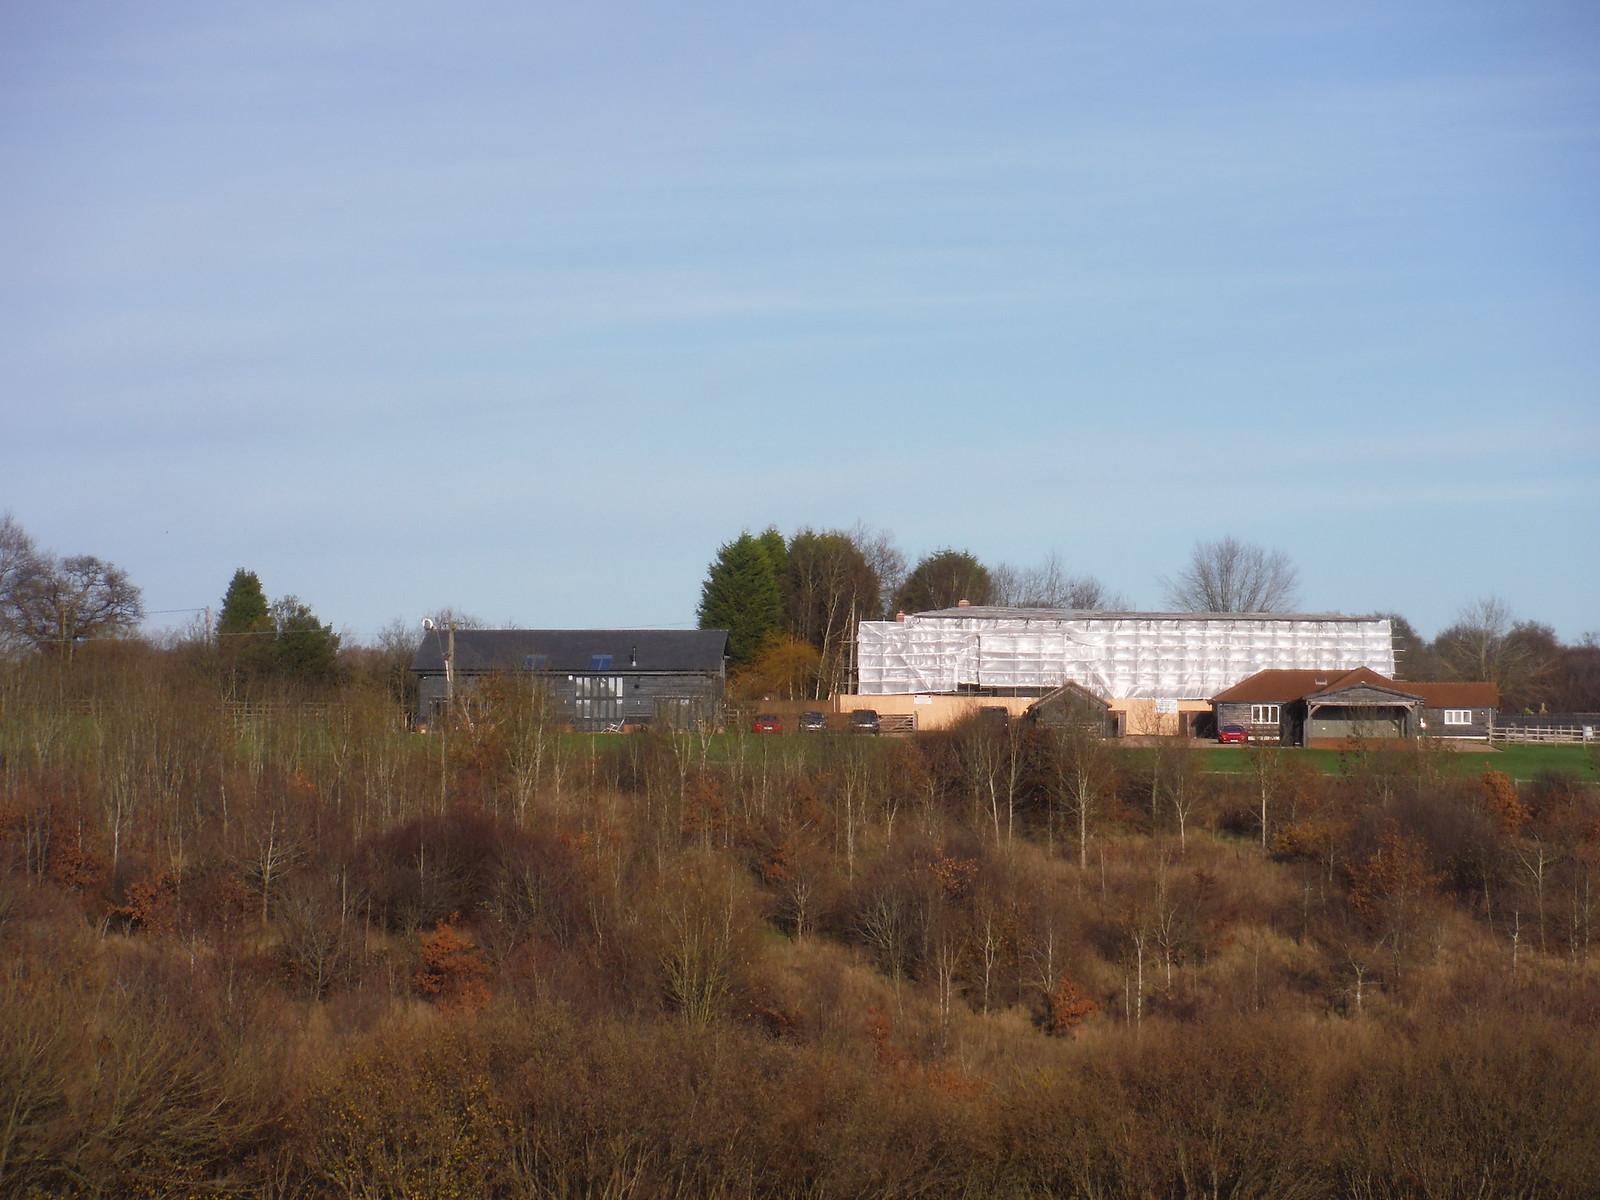 Erriwig Farm SWC Walk 140a Wendover to Great Missenden